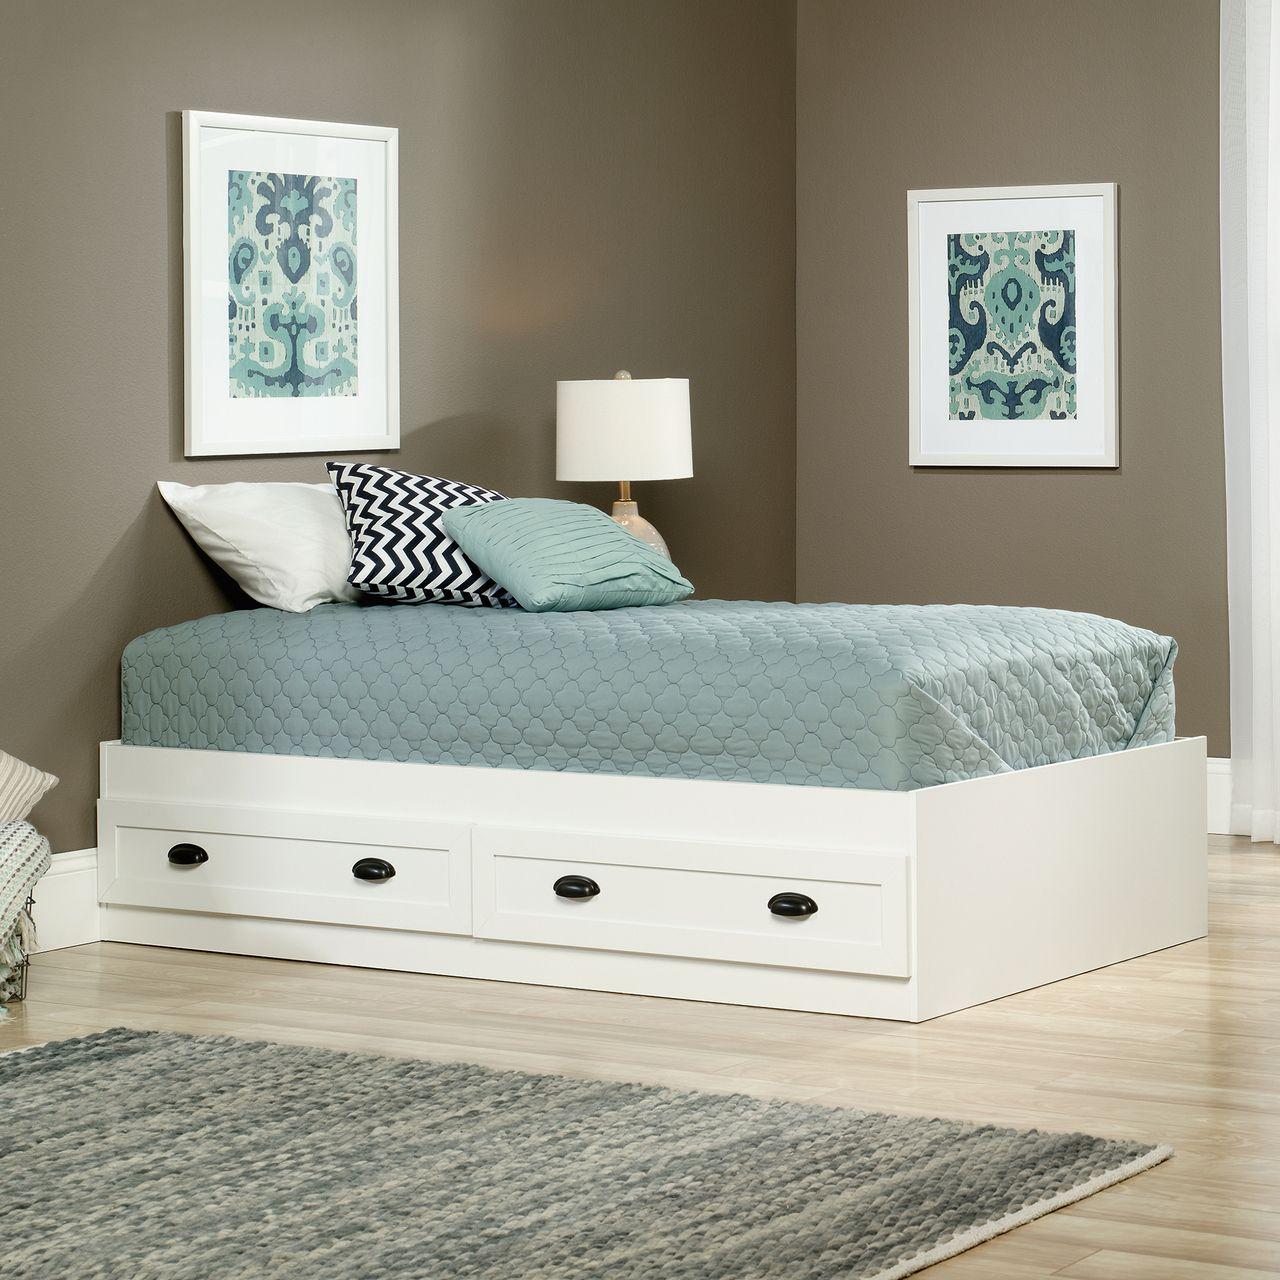 Furniture  Sauder County Line Twin Platform Bed 418535 Beds Platform and. Purple Green Bedroom   Descargas Mundiales com